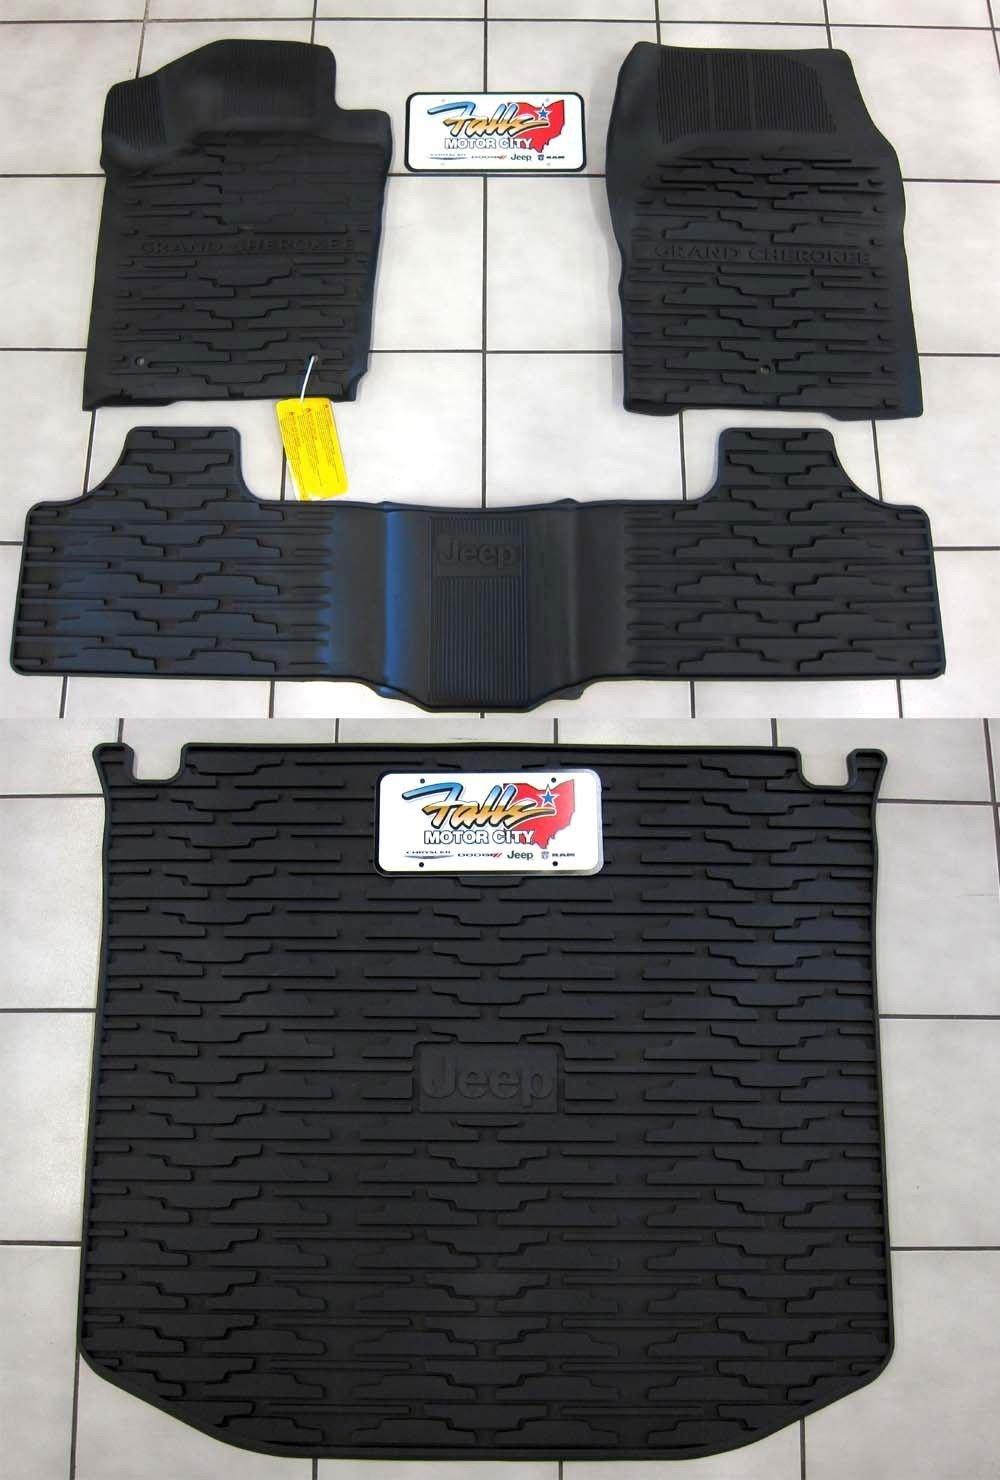 Rubber Floor Mats Jeep Cherokee - Amazon com jeep grand cherokee rubber slush floor mats cargo tray liner set automotive